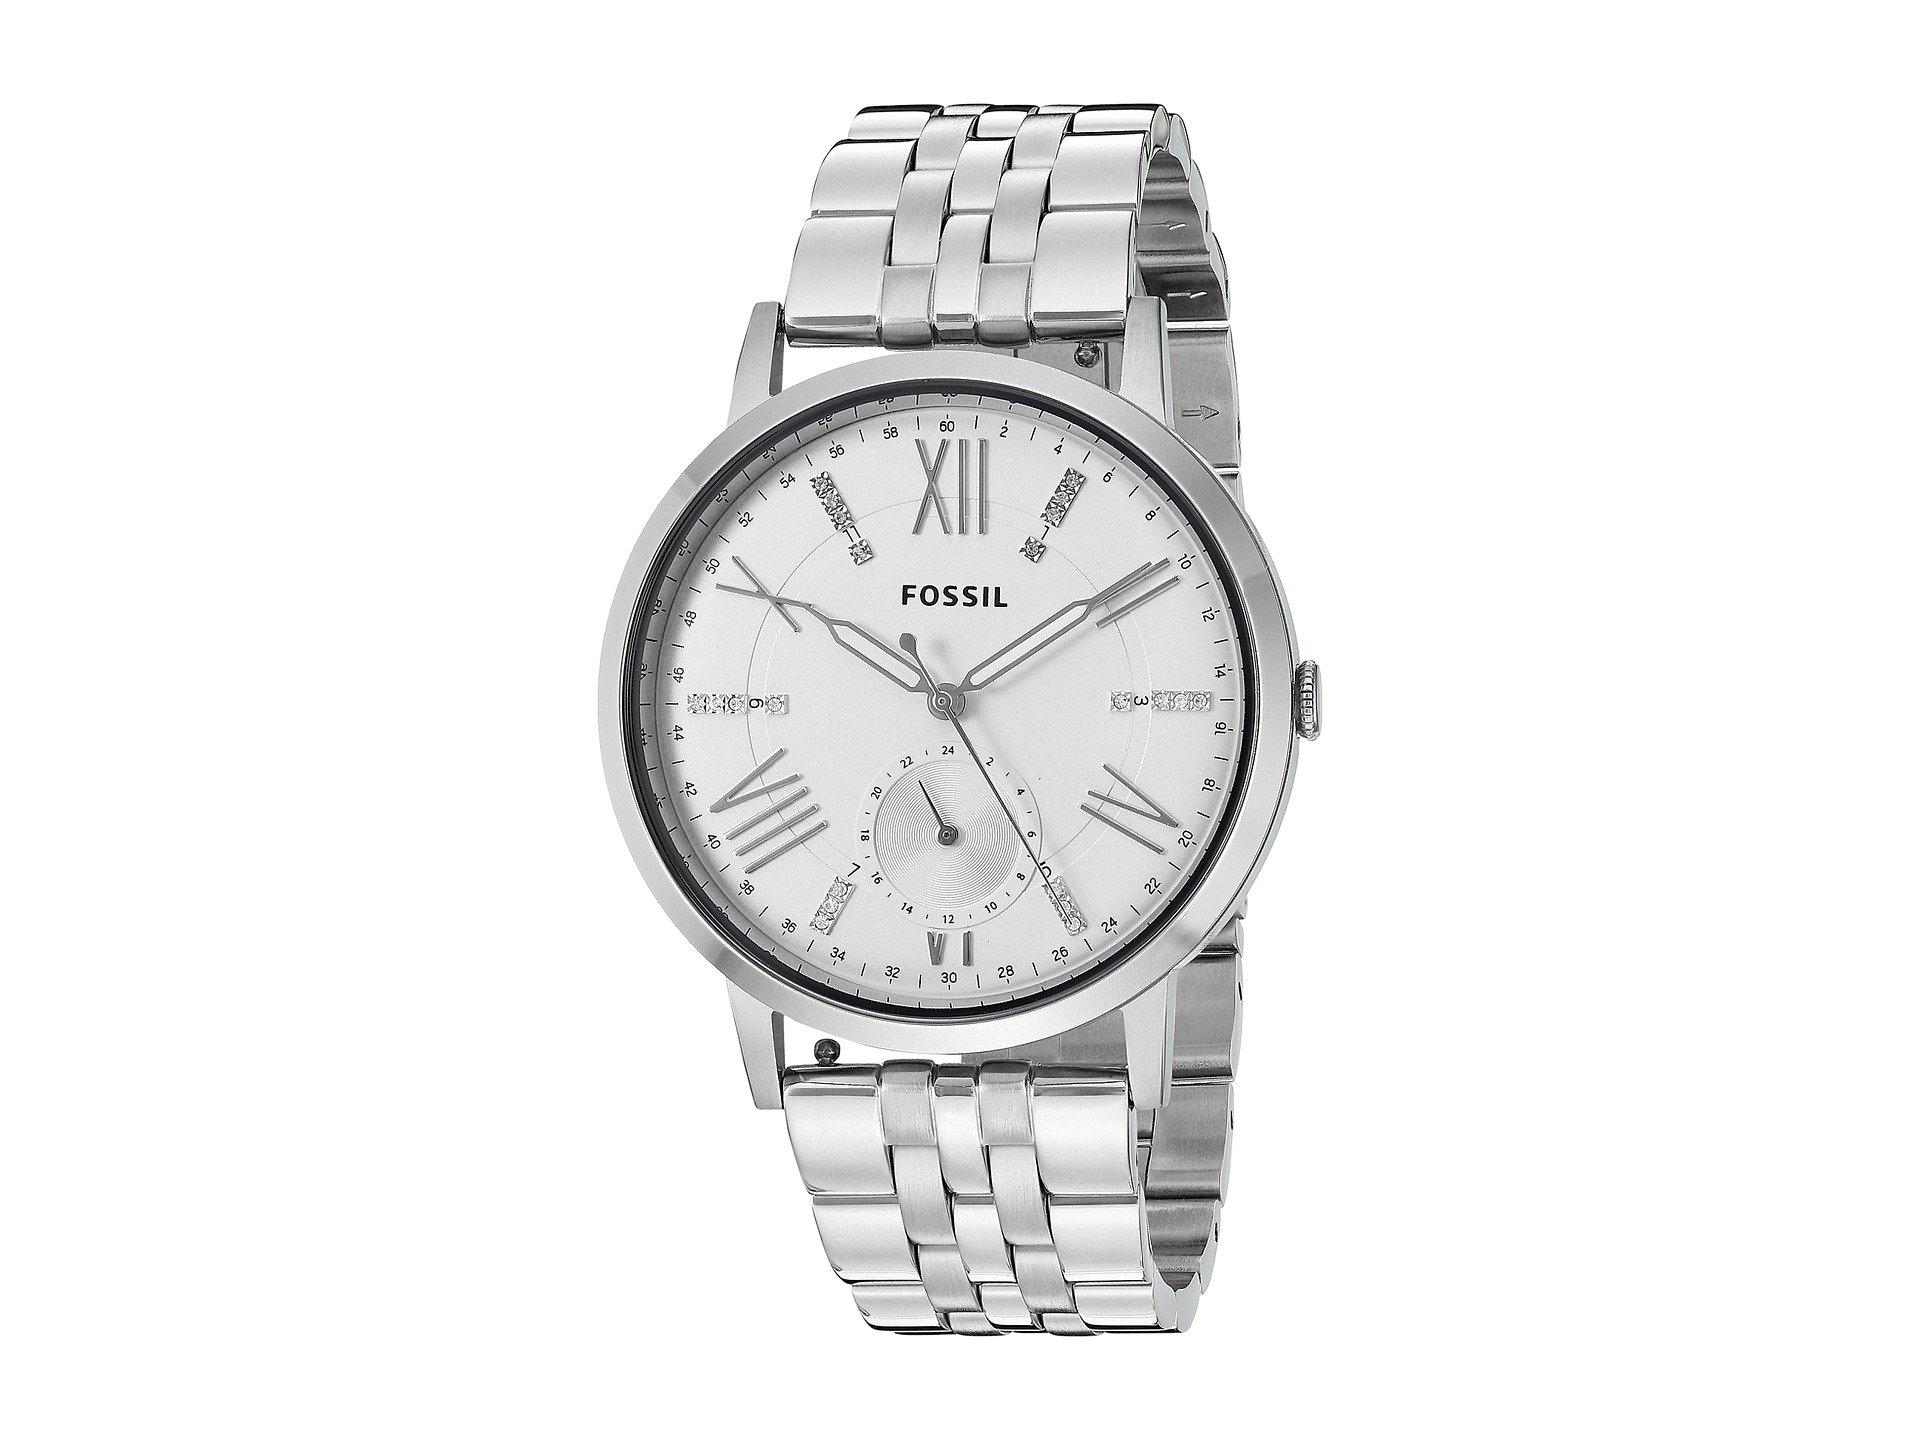 Reloj para Mujer Fossil Gazer - ES4160  + Fossil en VeoyCompro.net